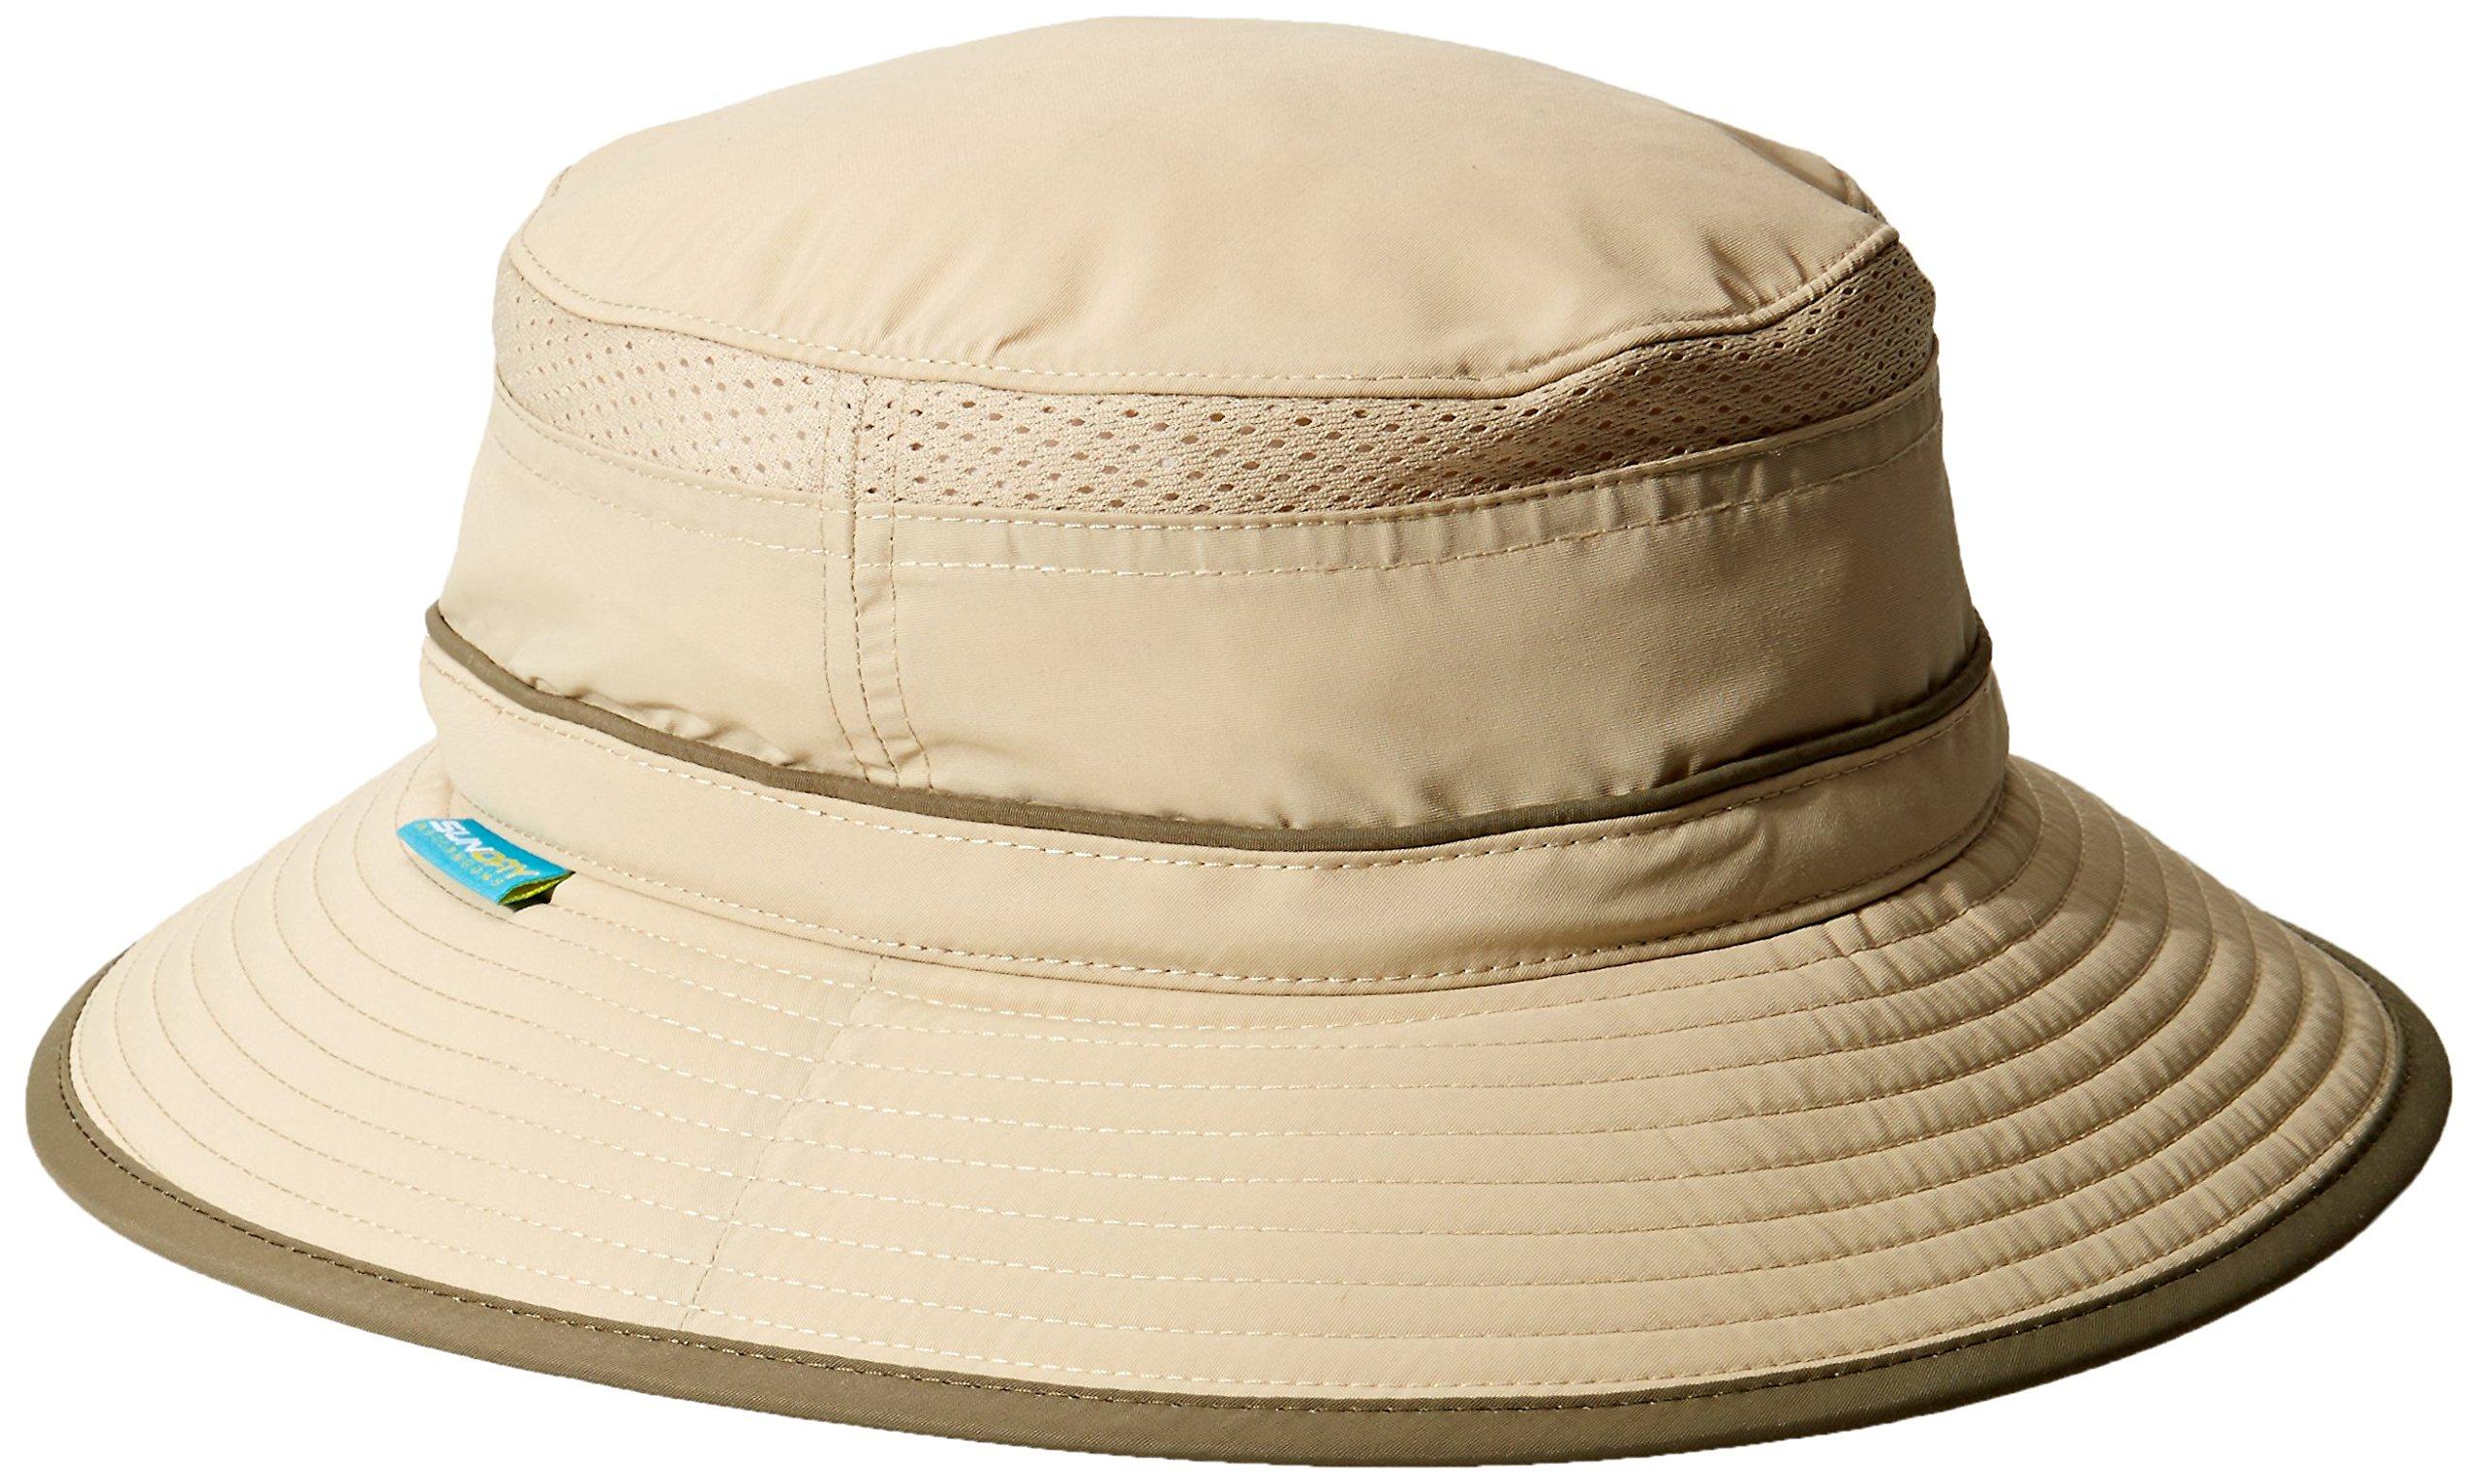 Sunday Afternoons Adventure Hat, Black/Black, Large